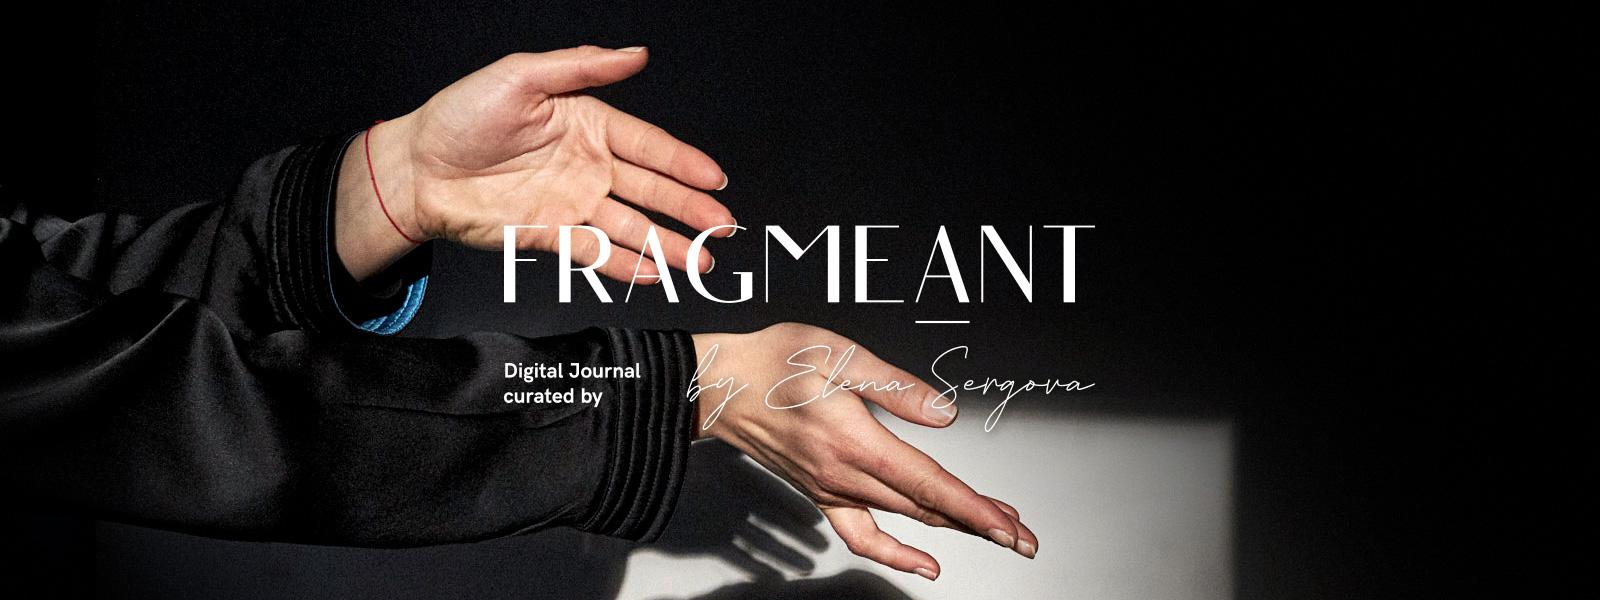 digital journal